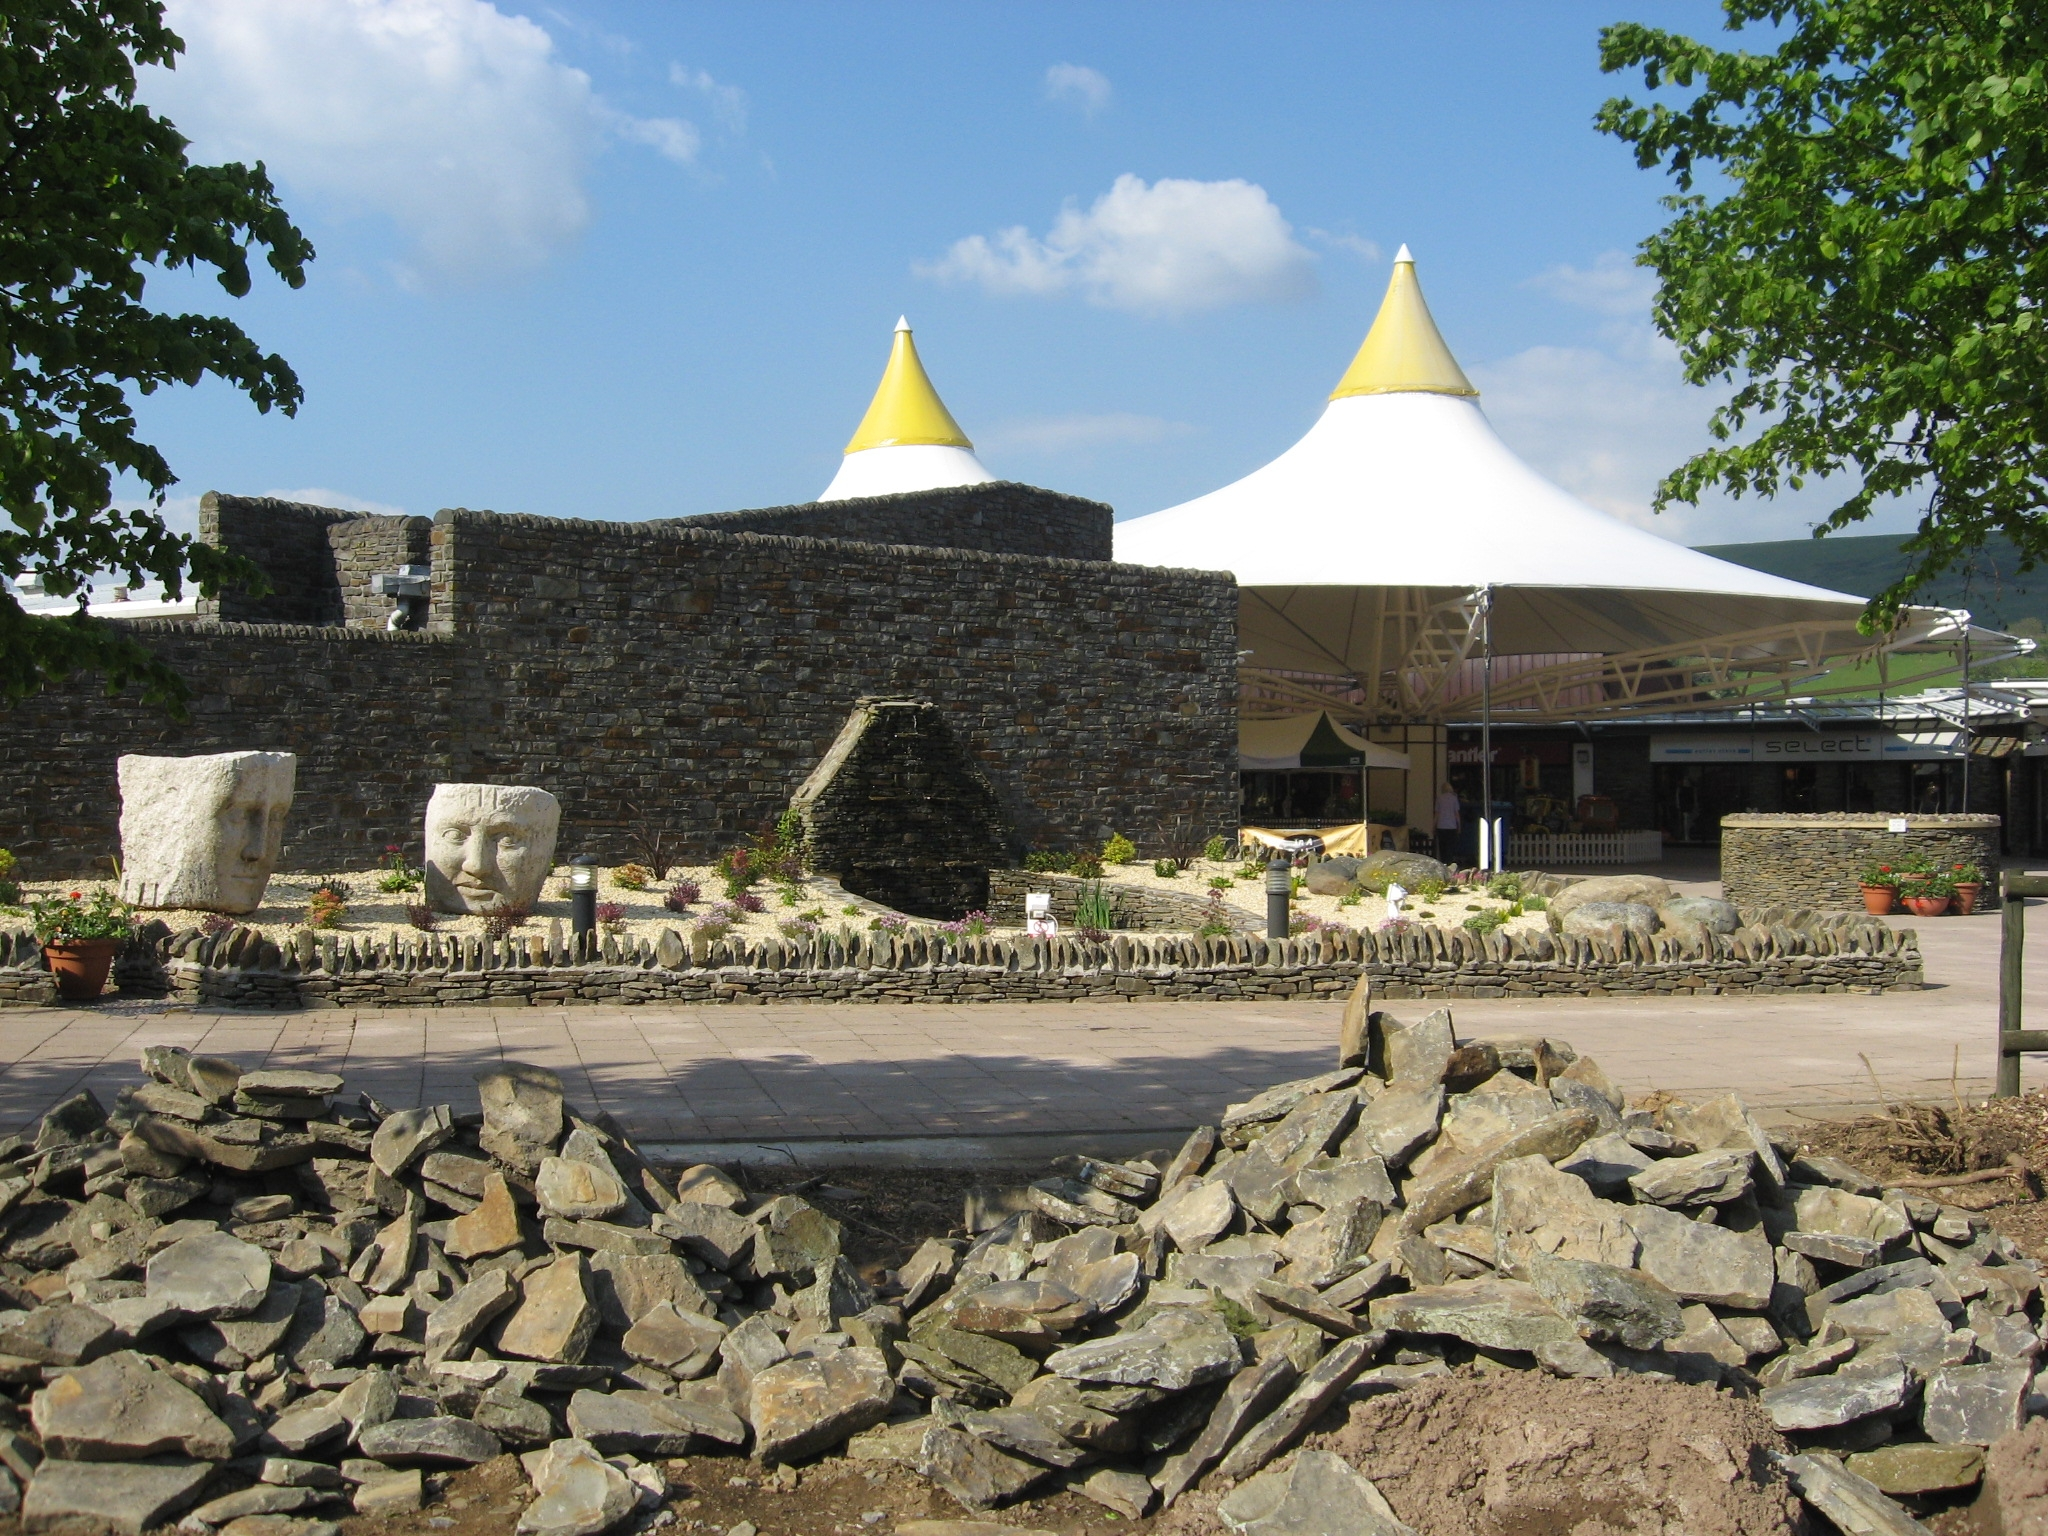 Festival Park Shopping - Ebbw Vale